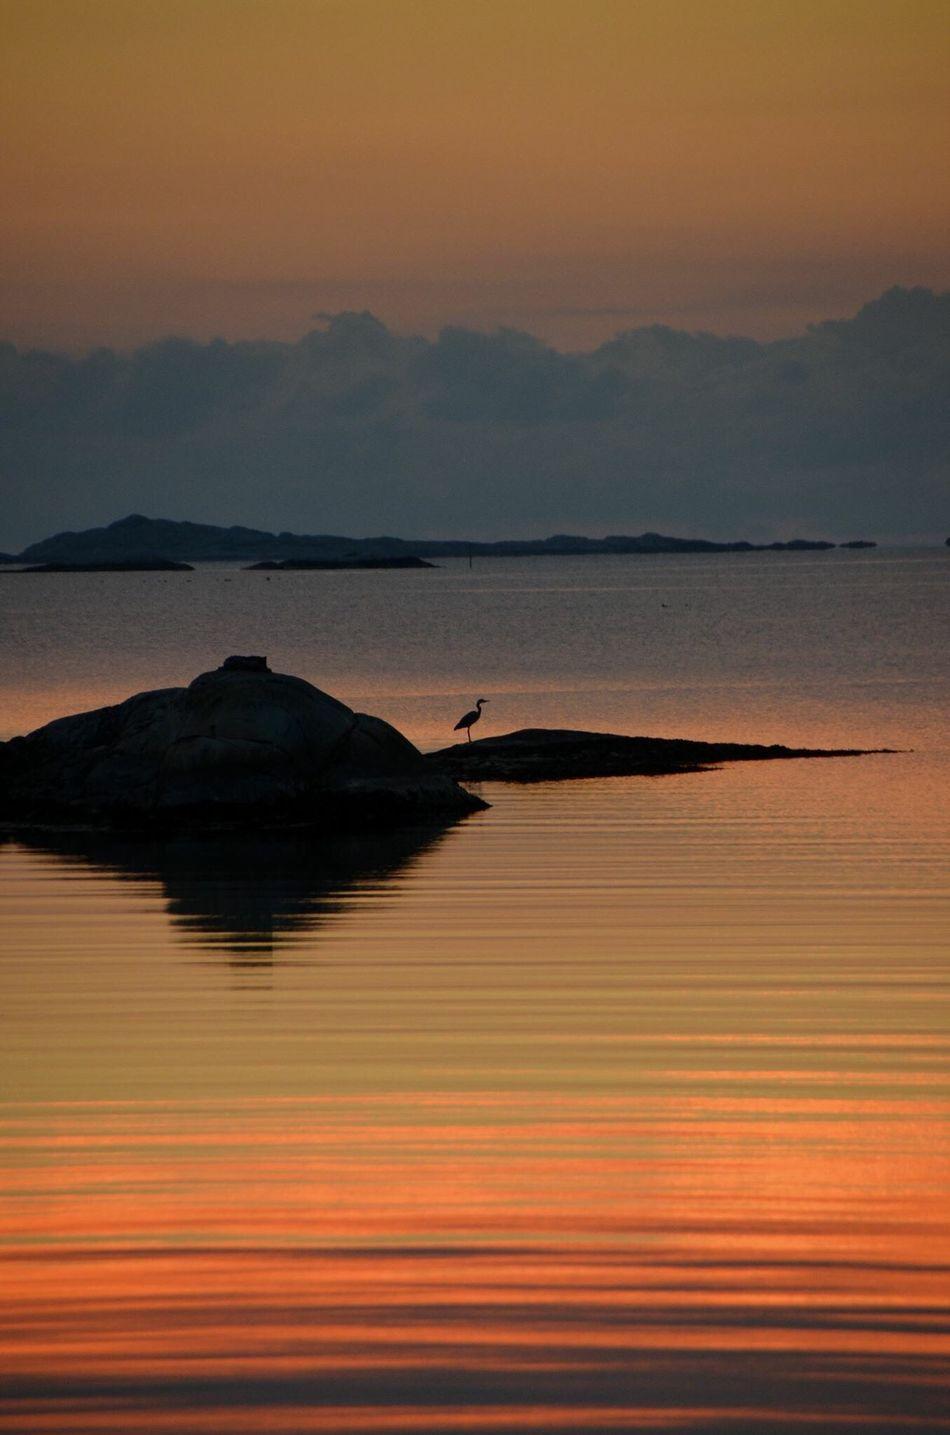 Bird in the sunset Sunset Silhouette Seaselfie Nature Seaside